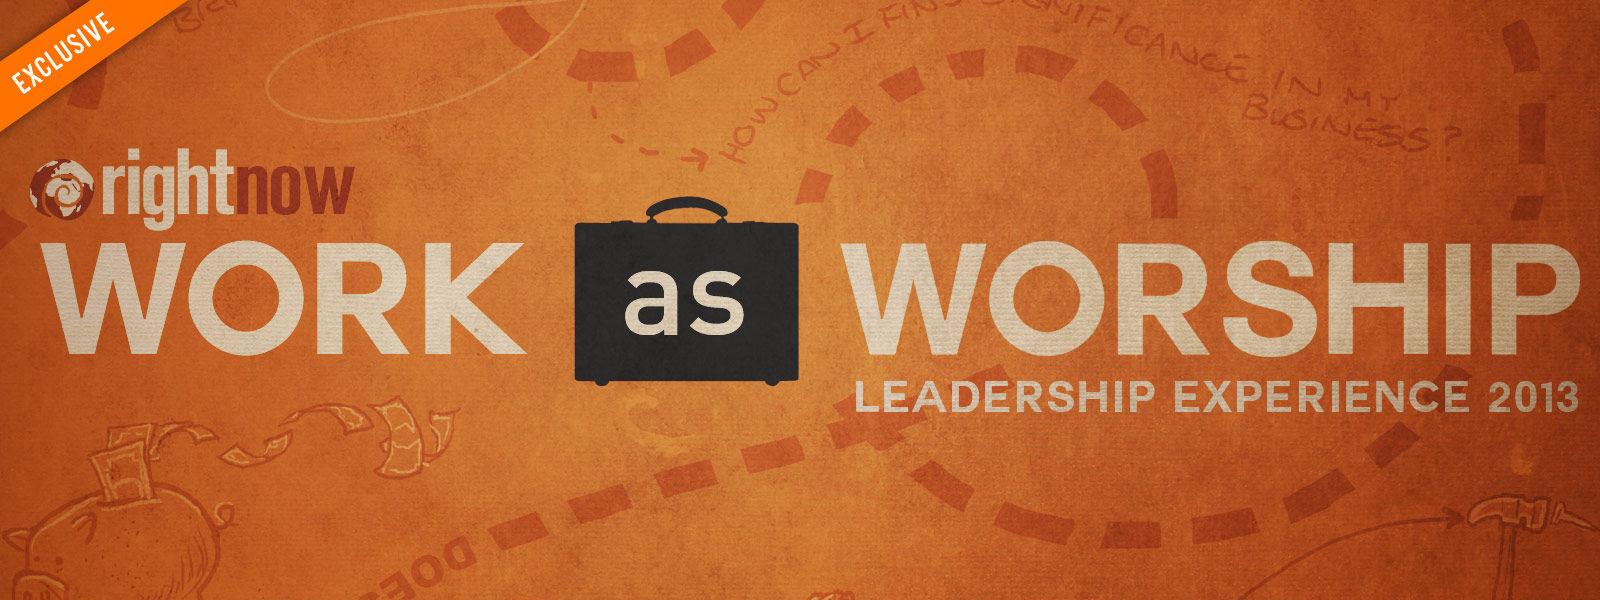 Work as Worship Leadership Experience 2013